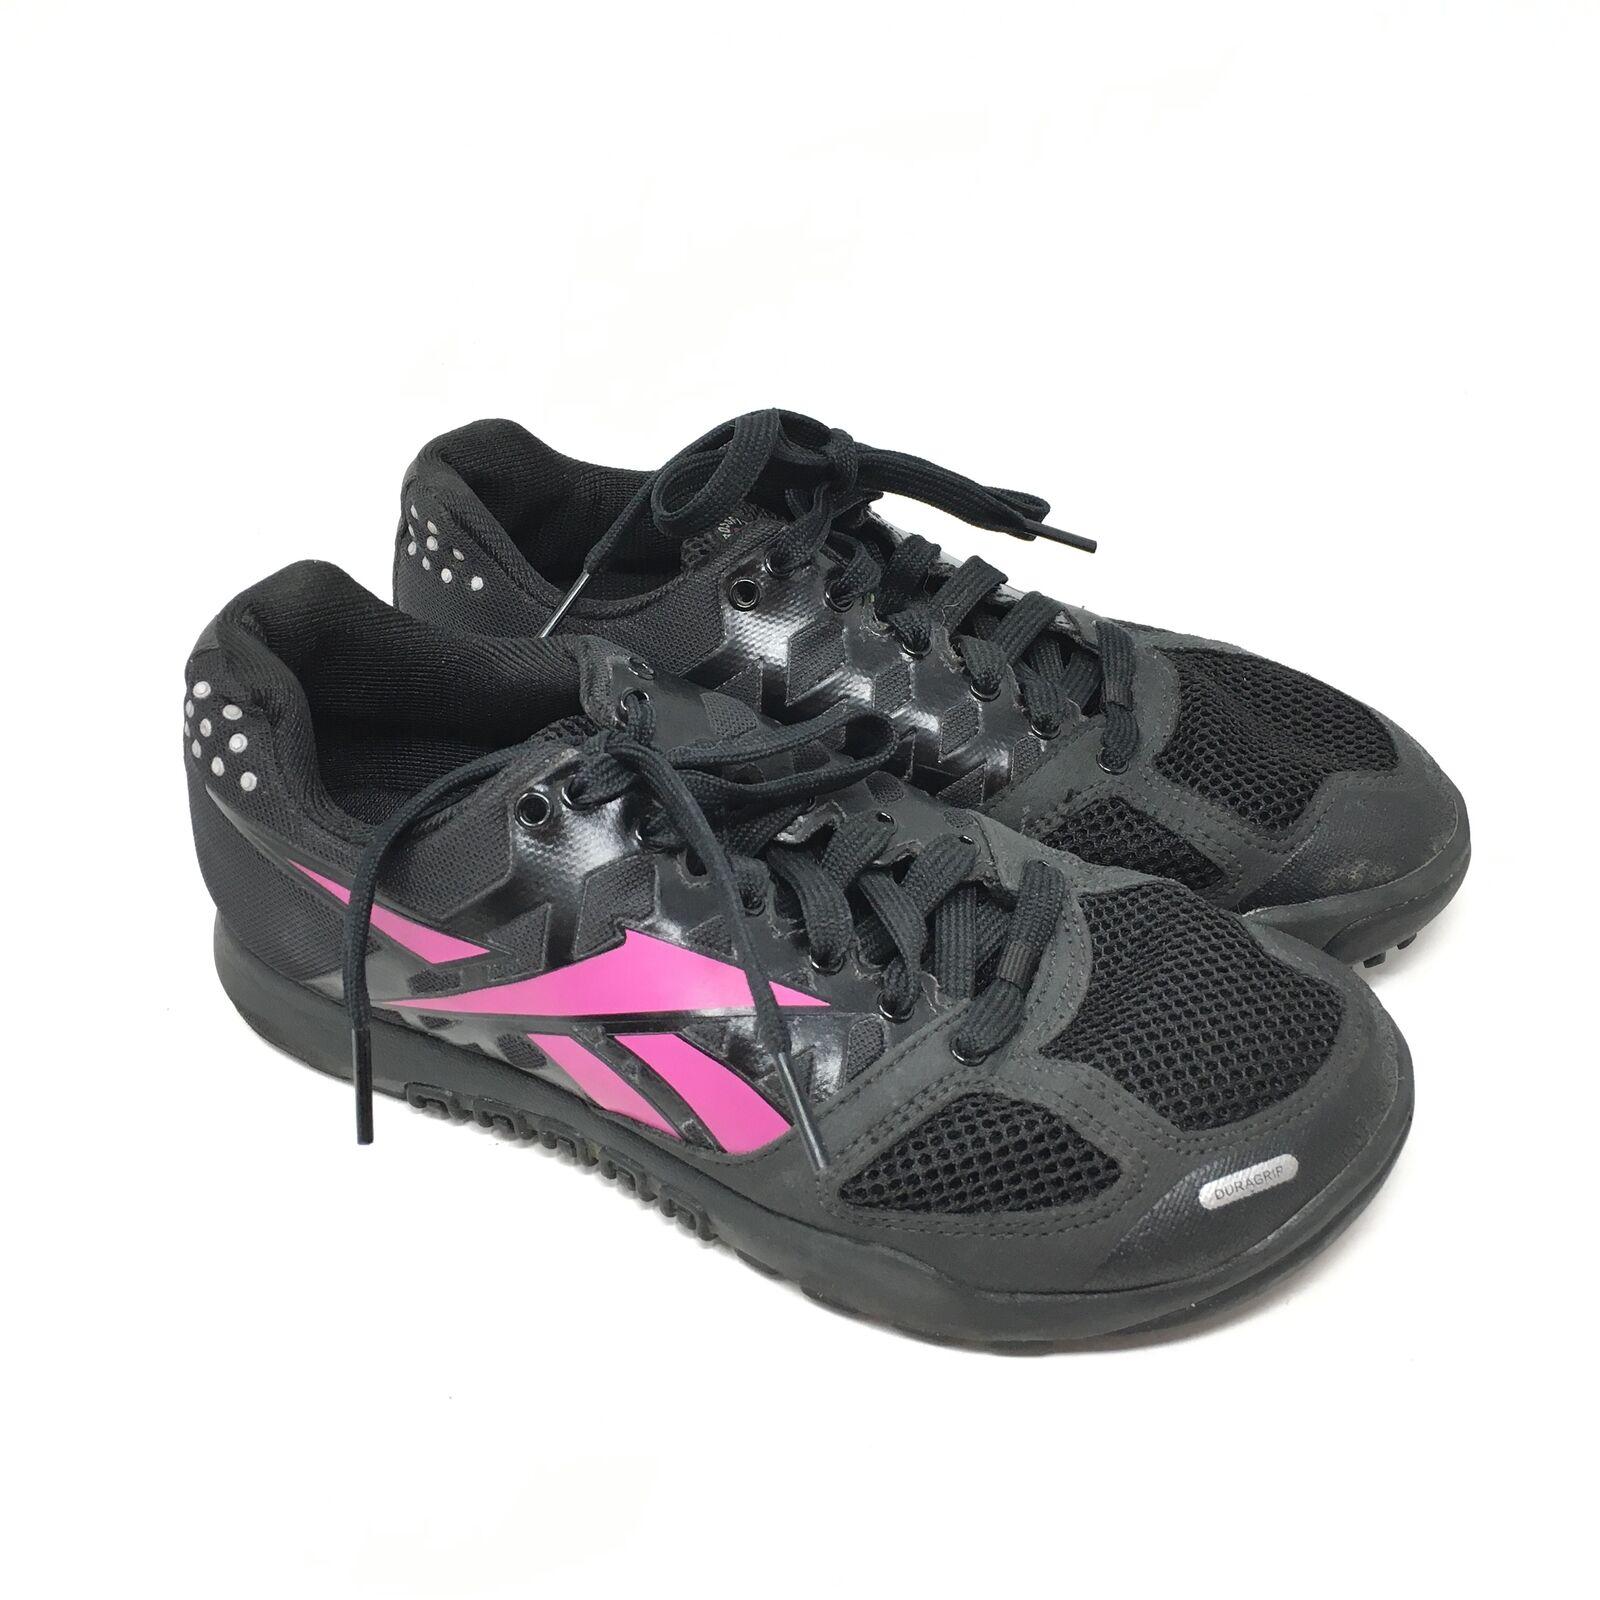 Women's Reebok CrossFit Nano 2.0 shoes Sneakers Size 6 Black Pink Training Z14